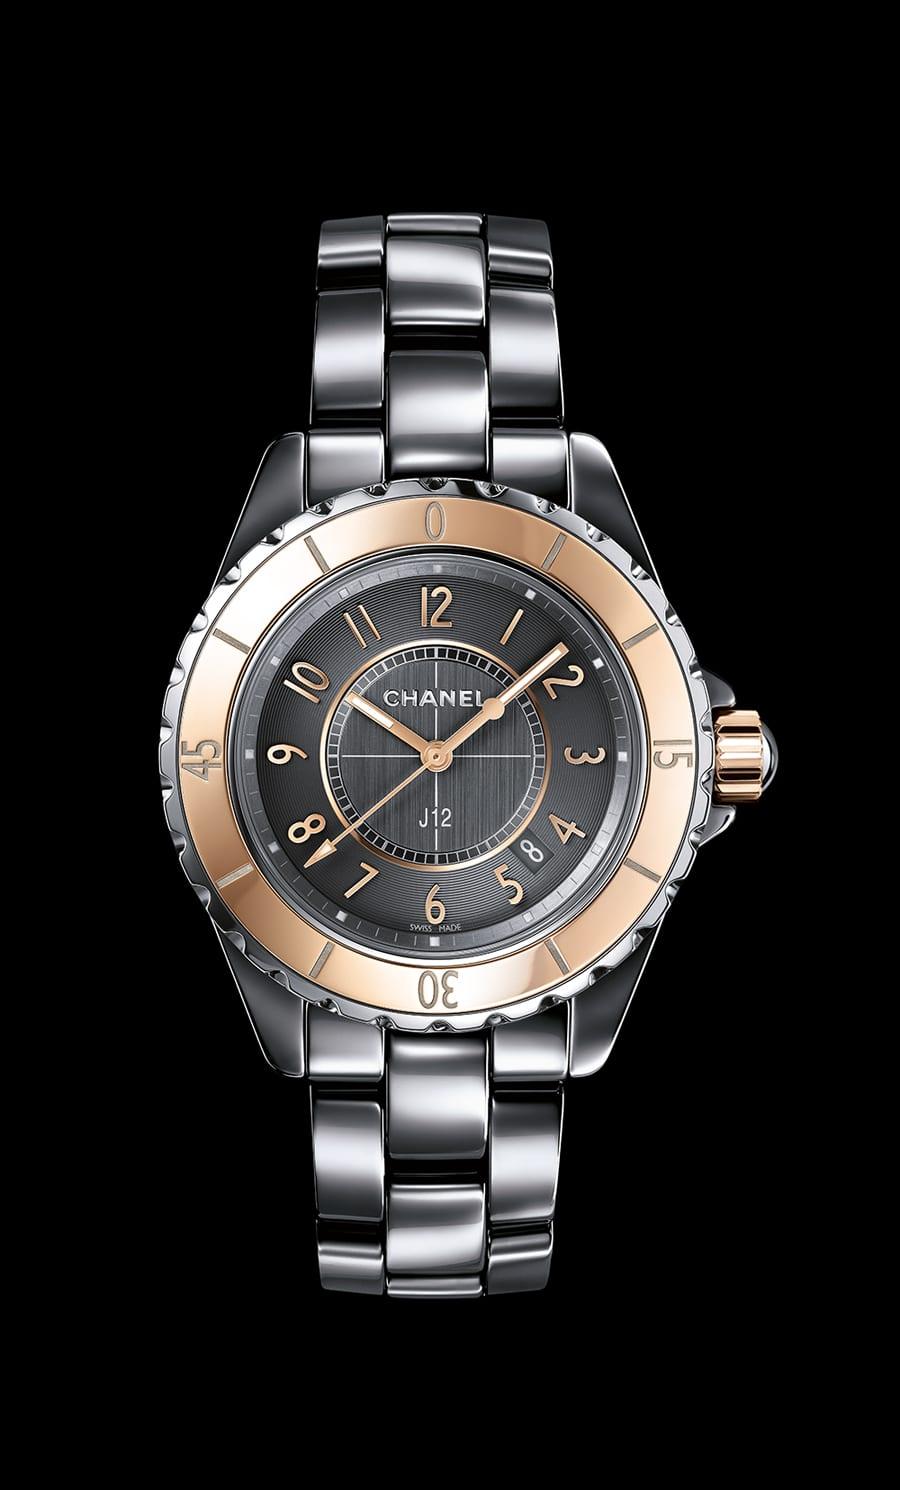 Chanel: J12 Chromatic Beige Gold